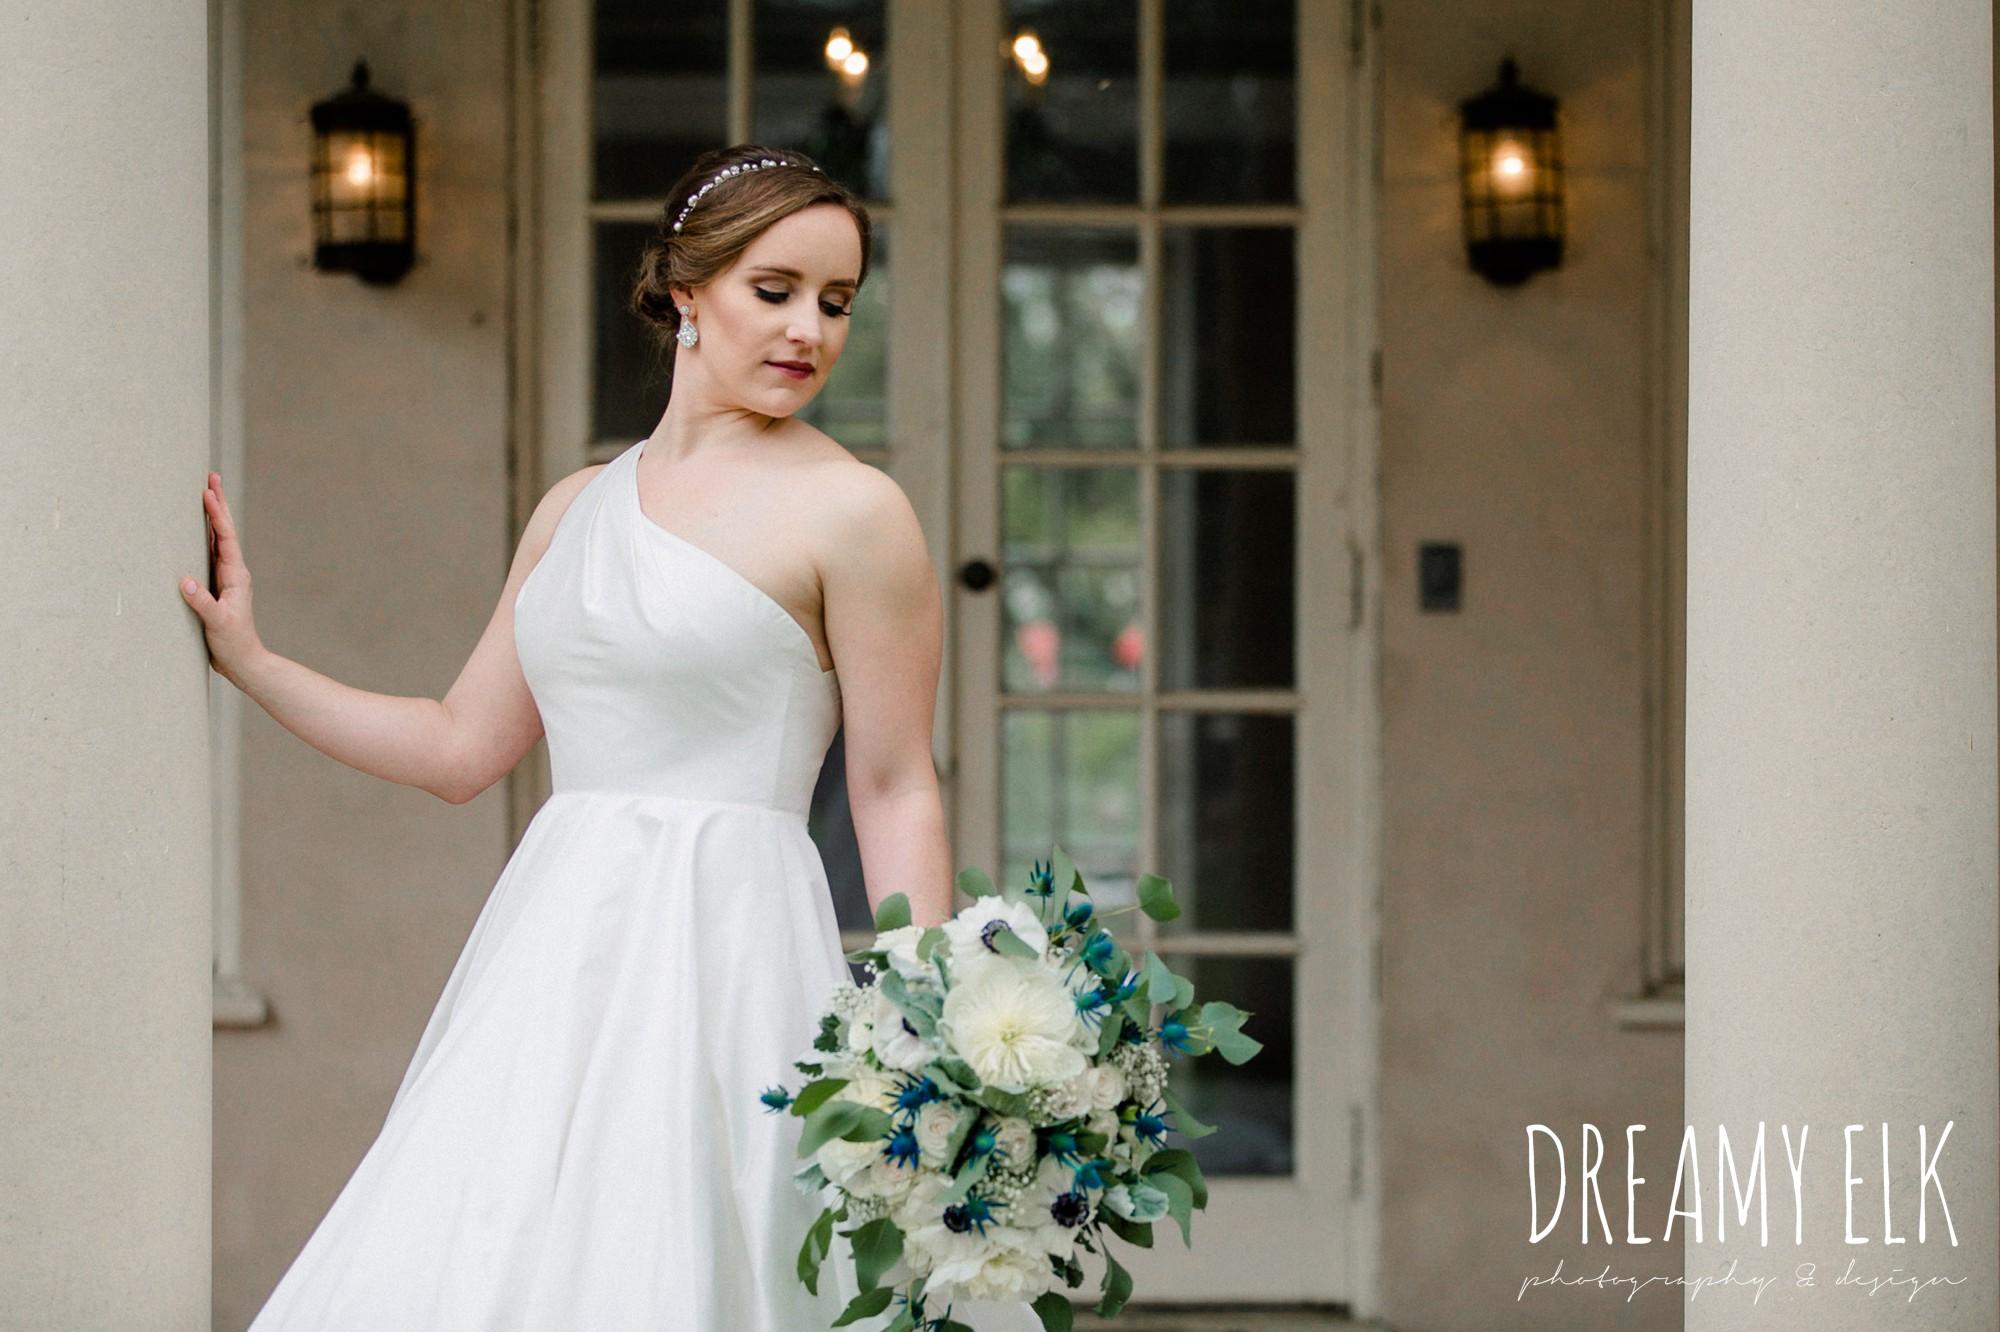 wedding hair updo, modern wedding dress ballgown, spring wedding, the astin mansion, bryan, texas, spring wedding, dreamy elk photography and design